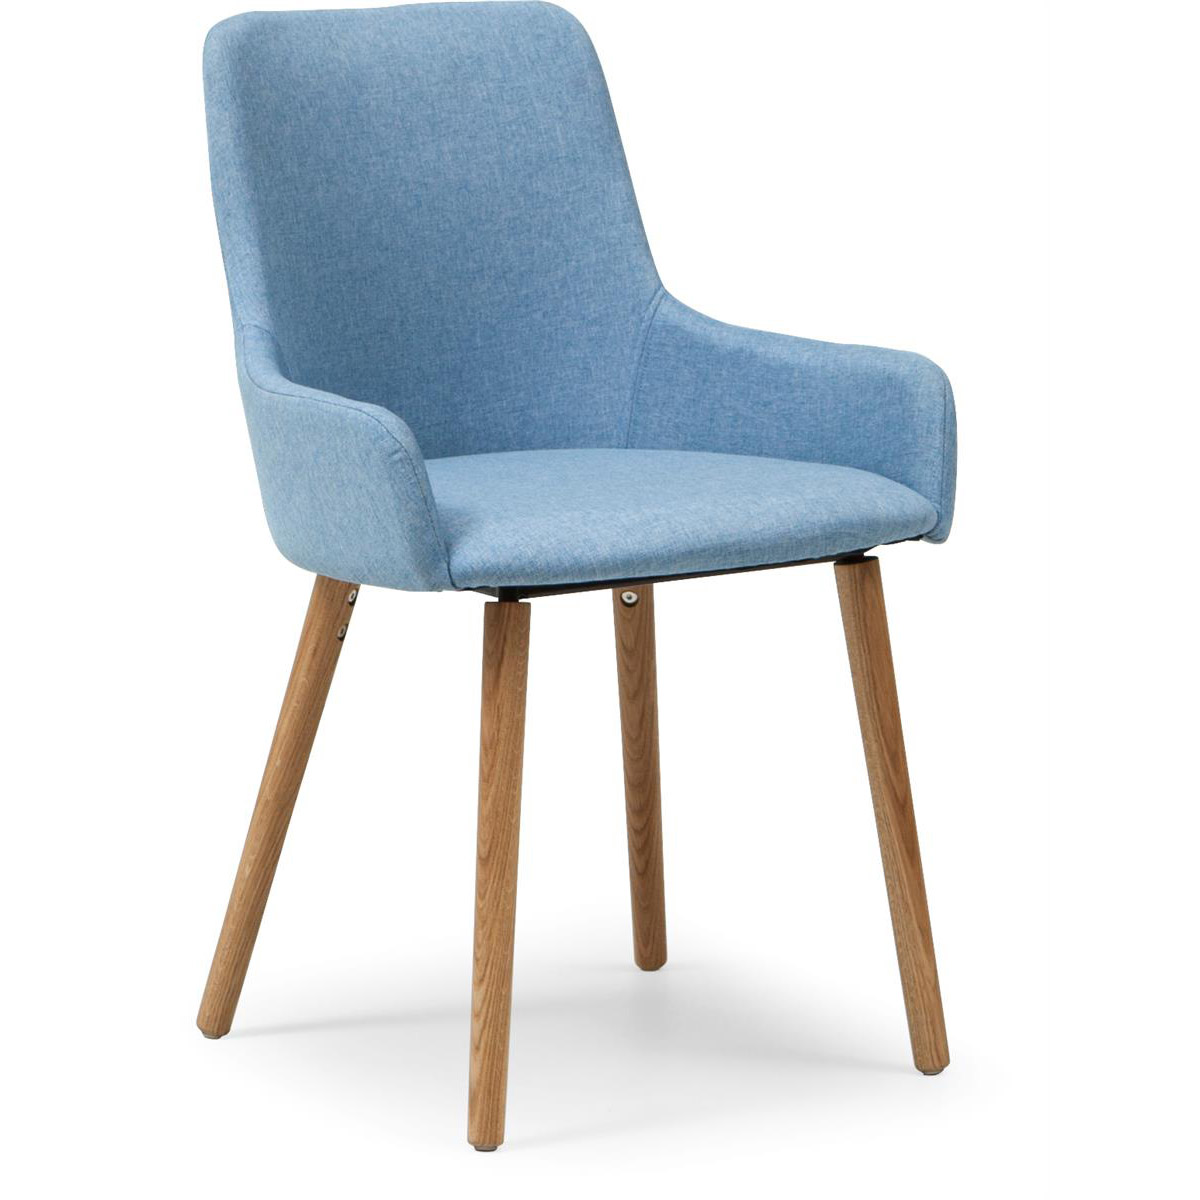 Bella blå stol tyg